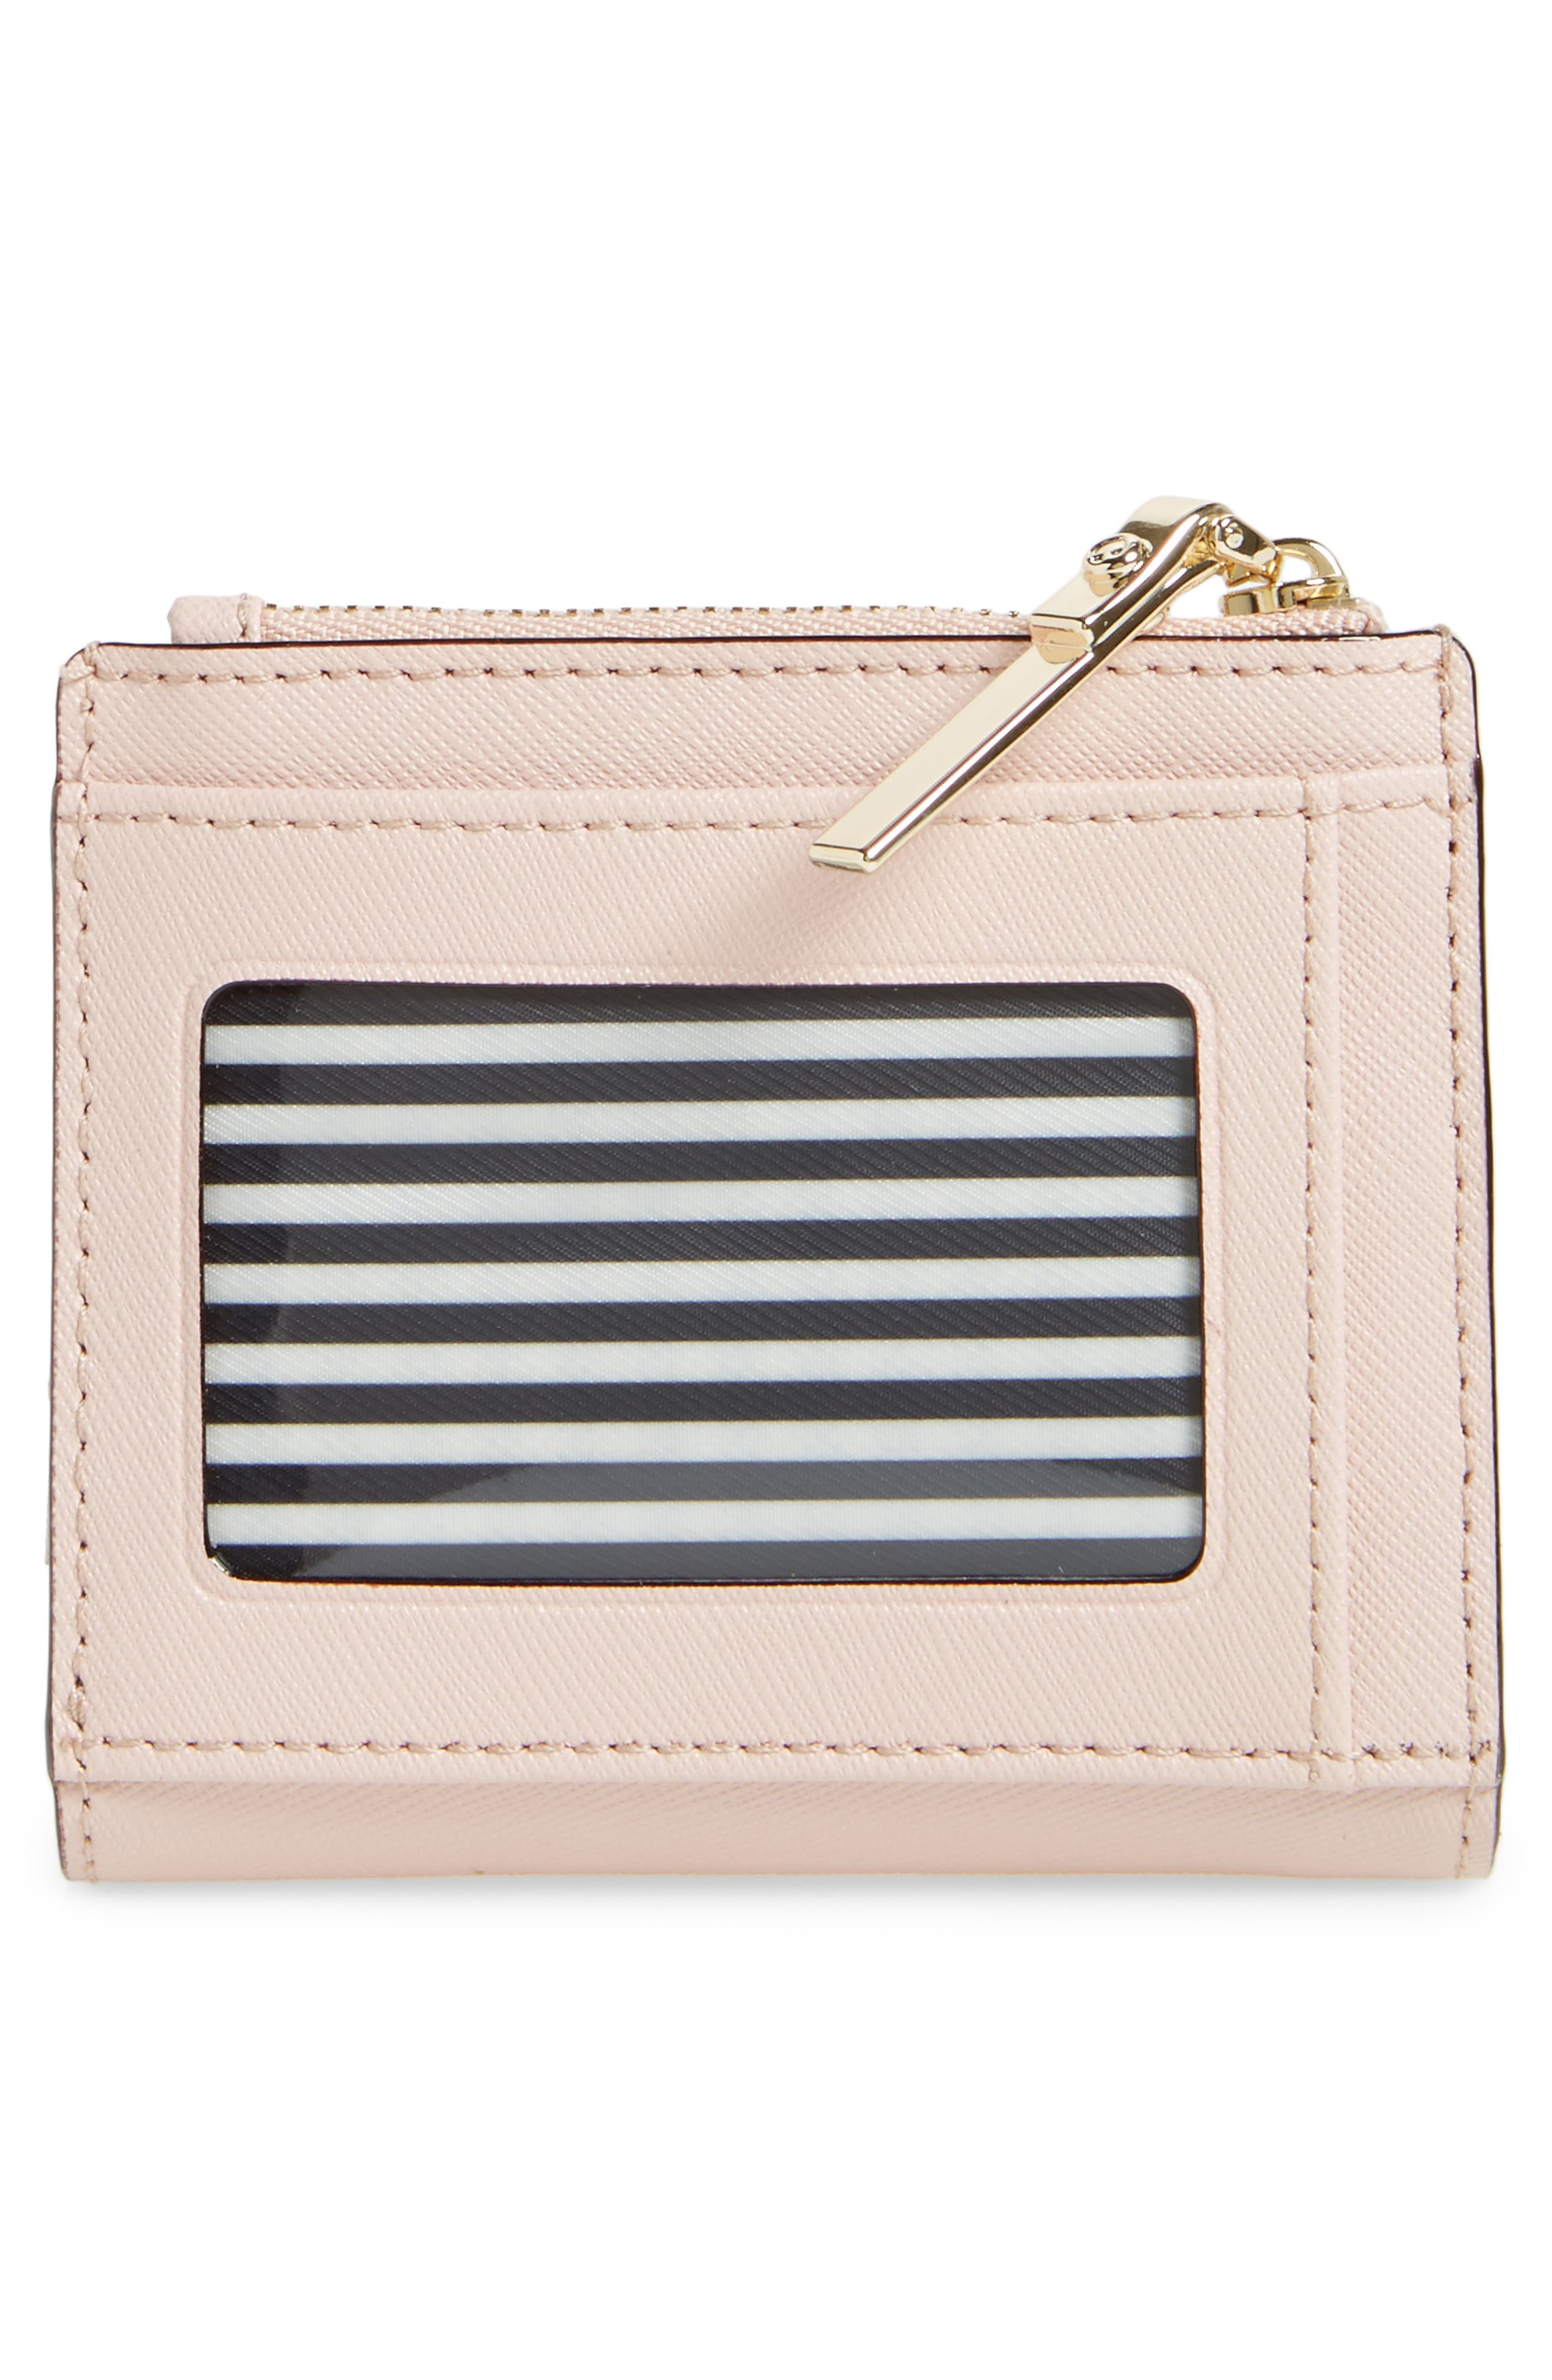 cameron street - adalyn slim leather wallet,                             Alternate thumbnail 4, color,                             Warm Vellum